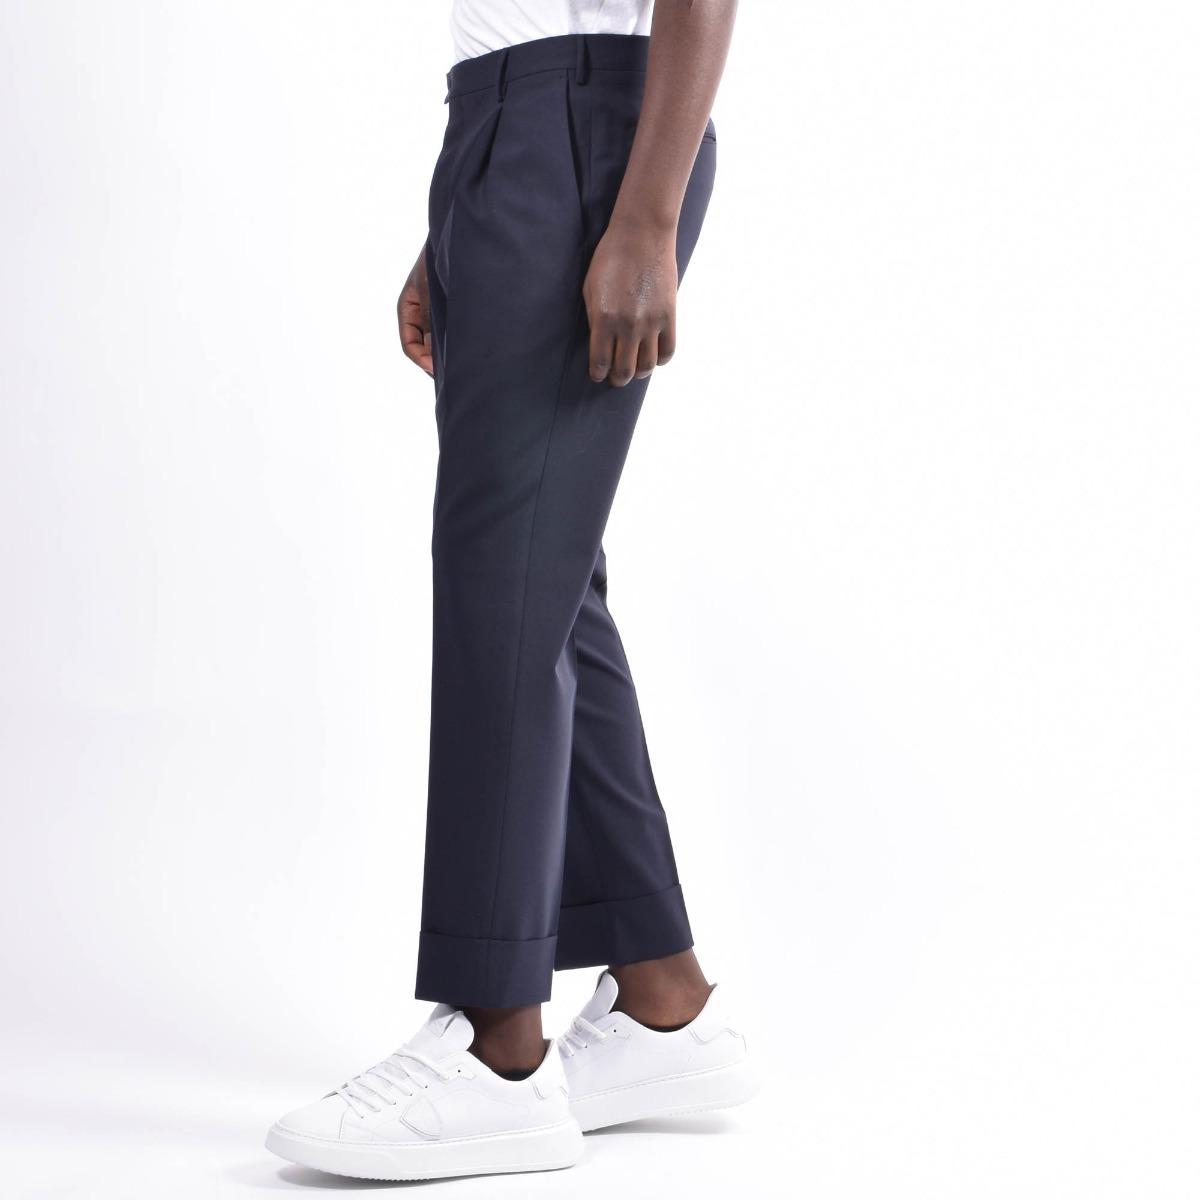 Pantalone pences pt - Blu